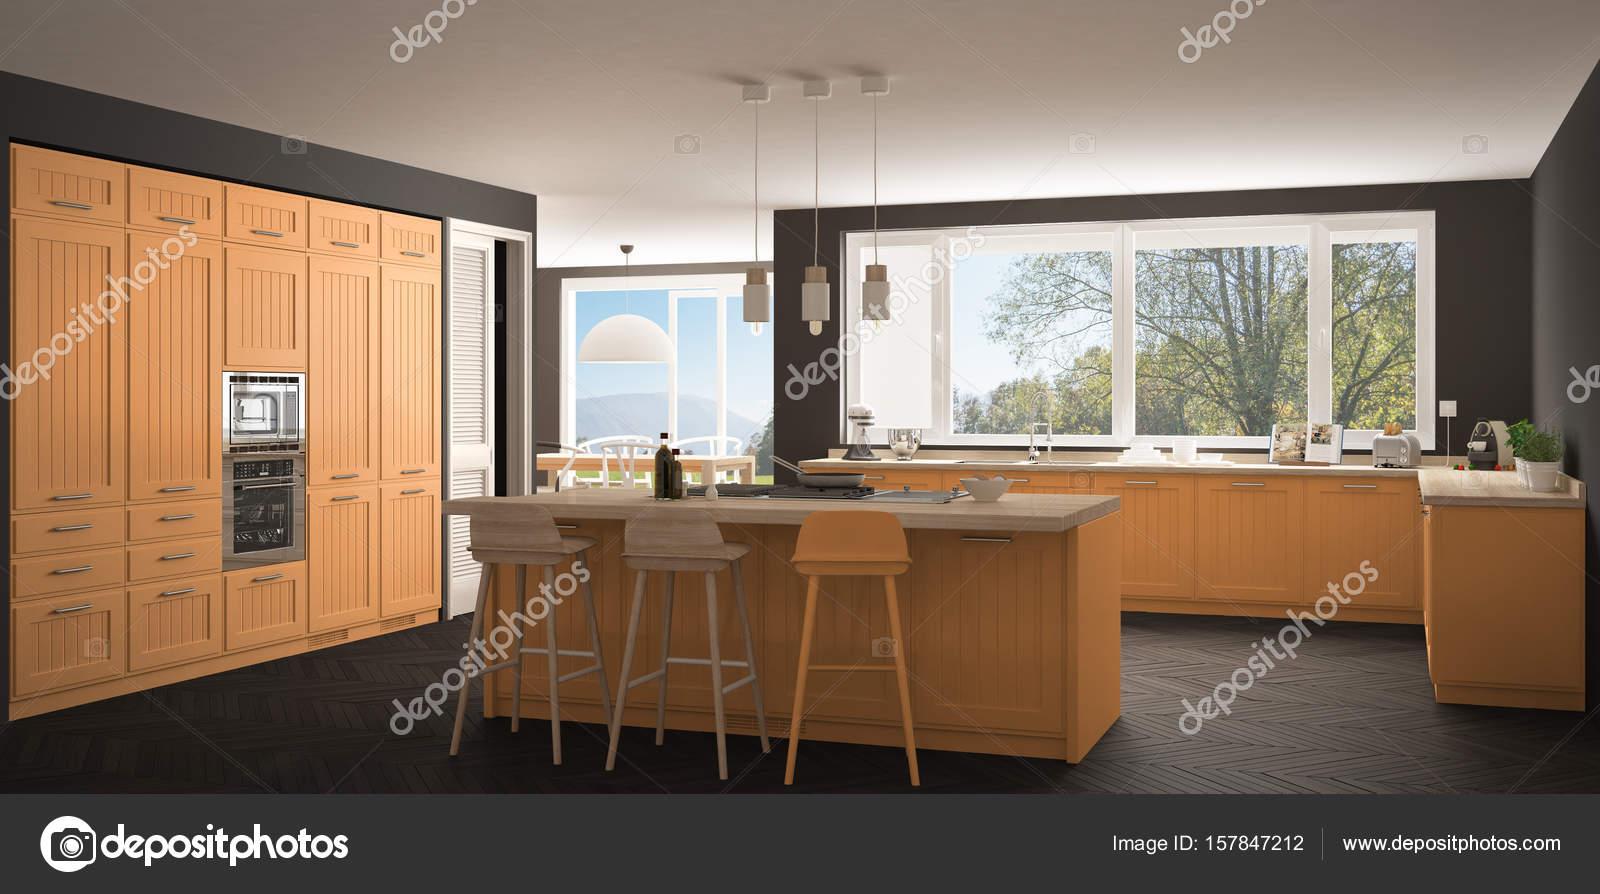 Skandinavien-Küche mit großen Fenstern, Panorama klassische gr ...